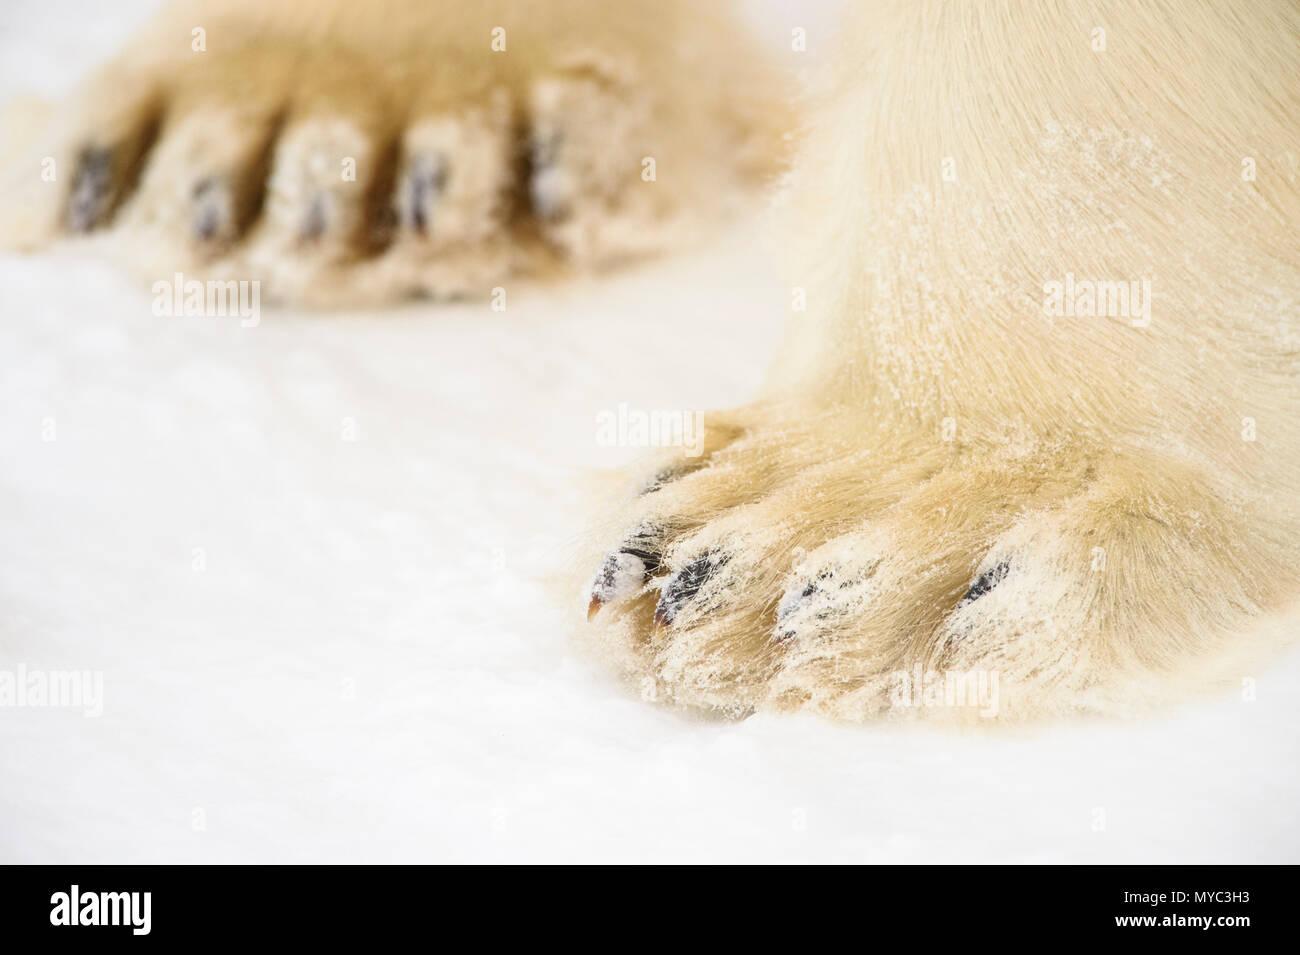 Polar Bear (Ursus maritimus) Legs and paws, Wapusk National Park, Cape Churchill, Manitoba, Canada Stock Photo